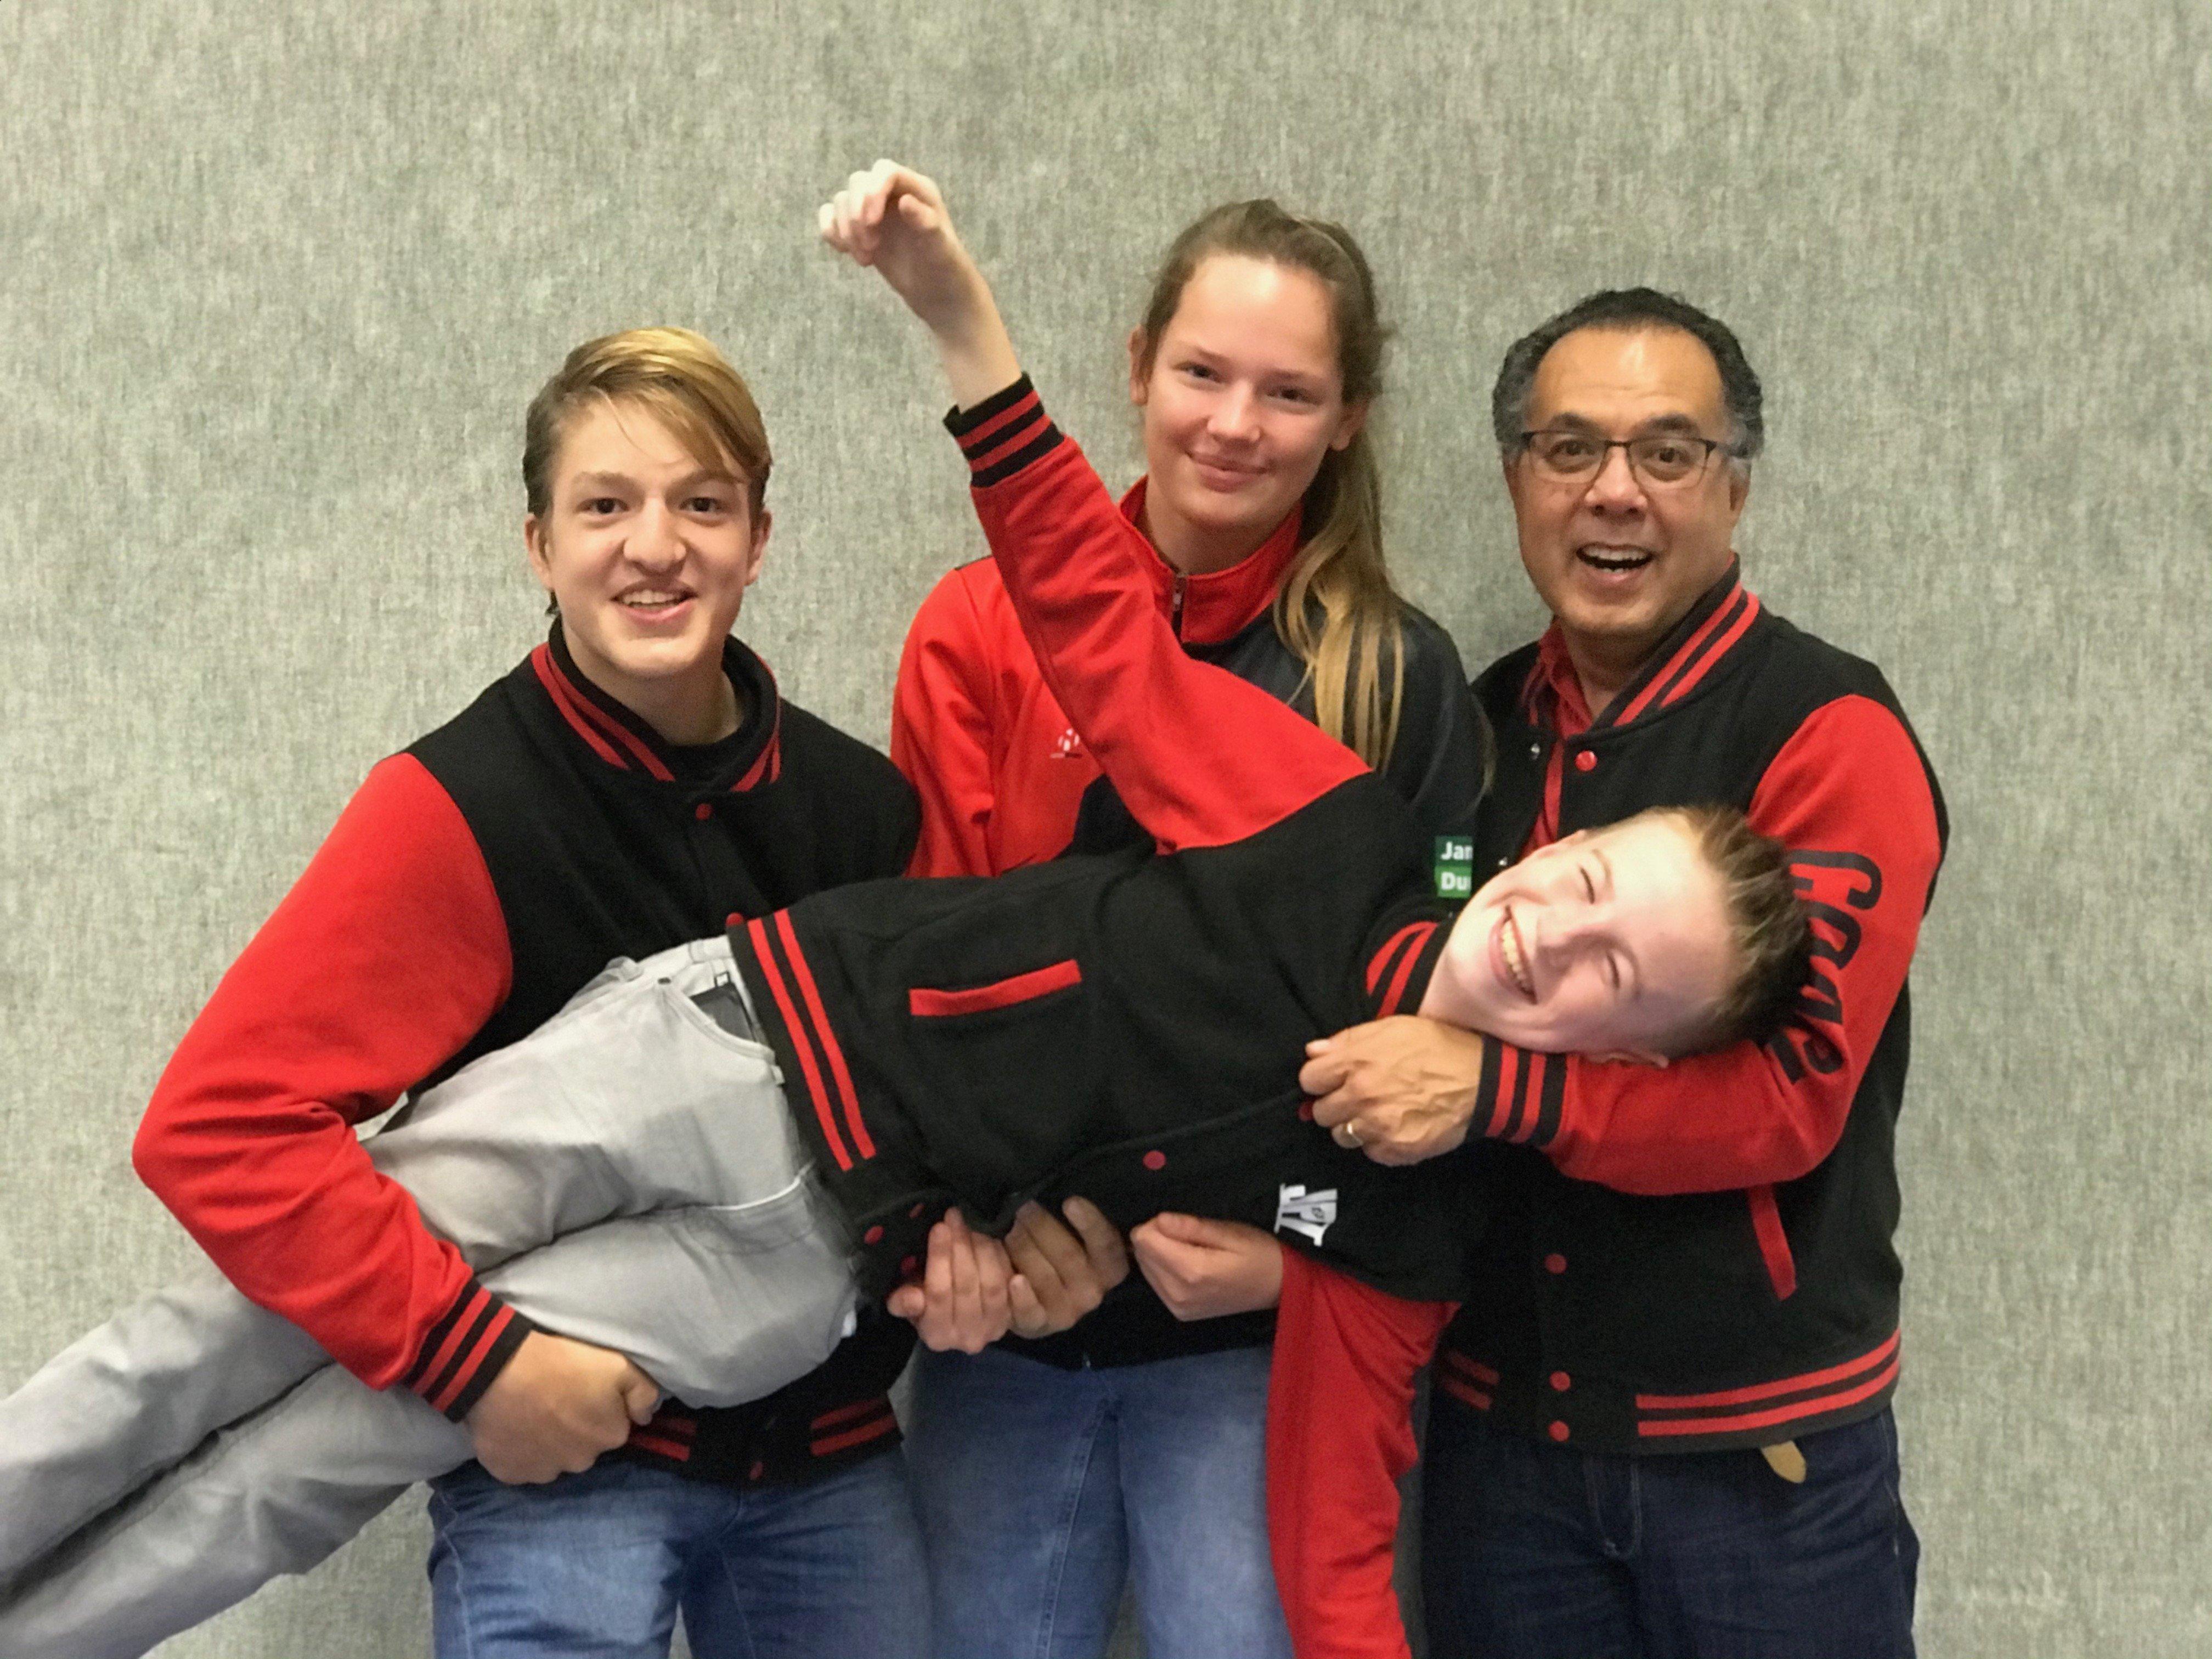 Begeleidingsteam. vlnr Marijn Hanstede, Eva-loes Huitsing en Ferry Evenberg. Dwarsligger: Bjorn Linde.